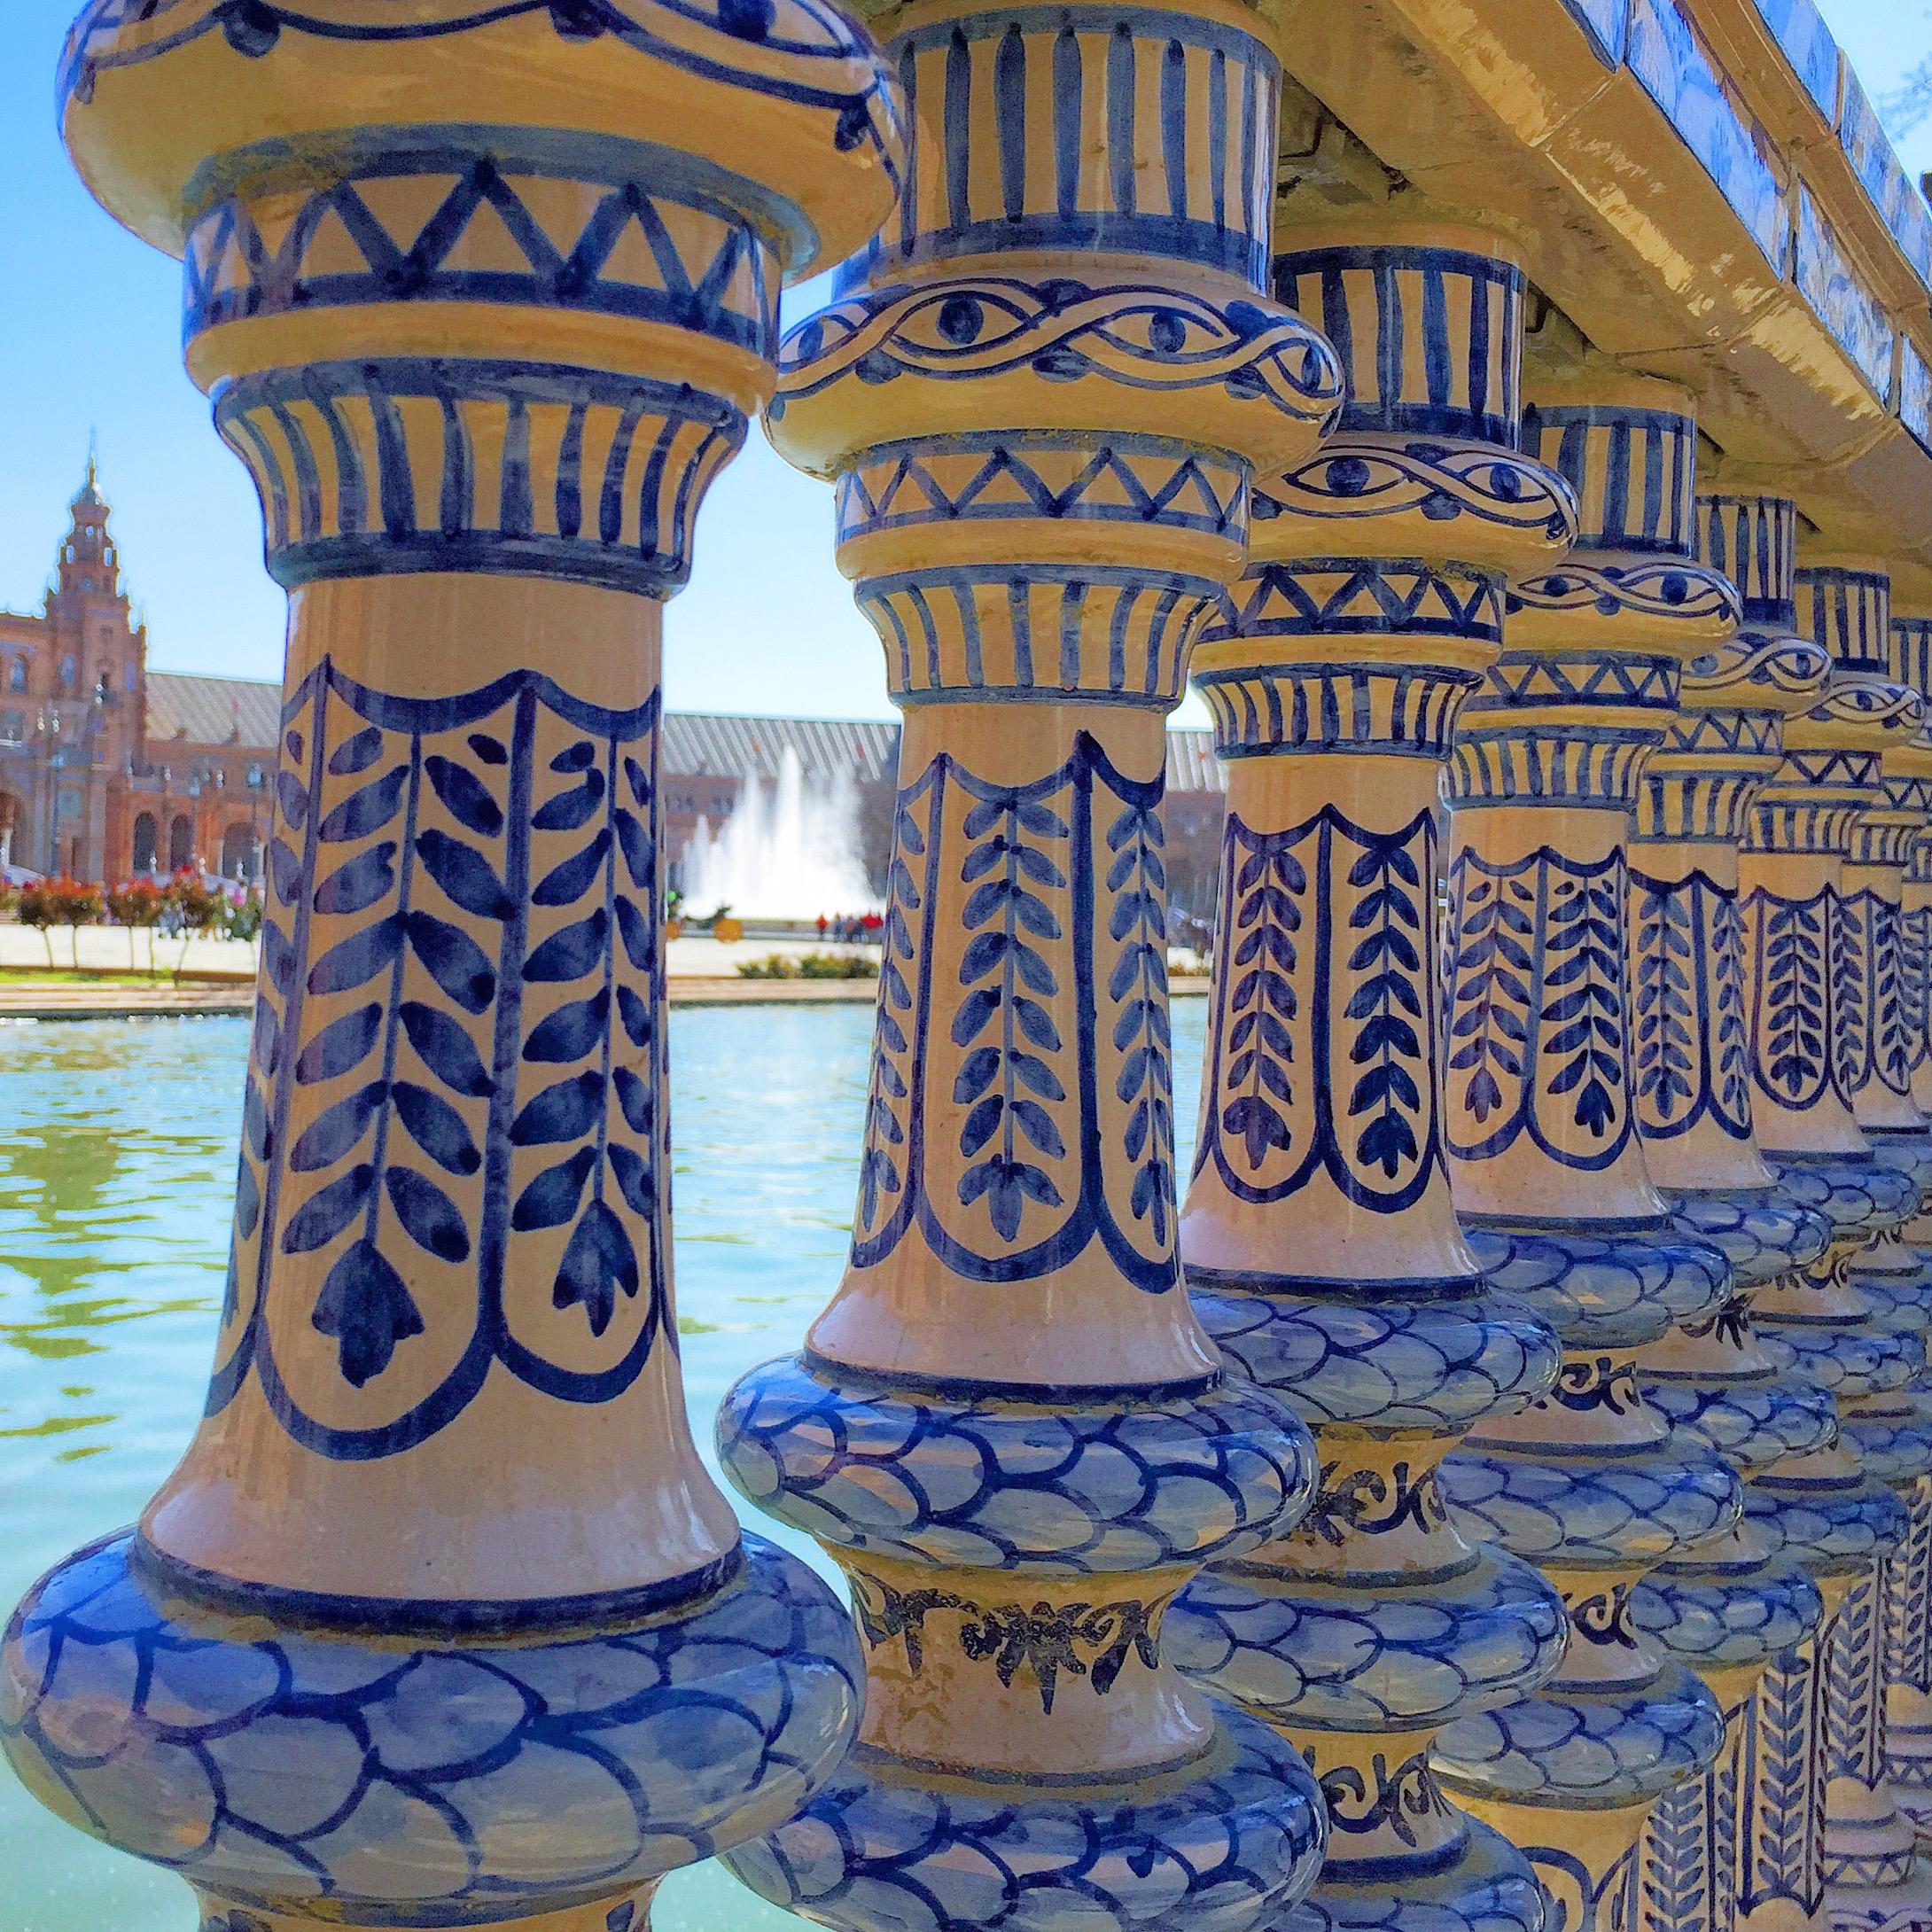 Plaza España, Sevilla - Spain '15